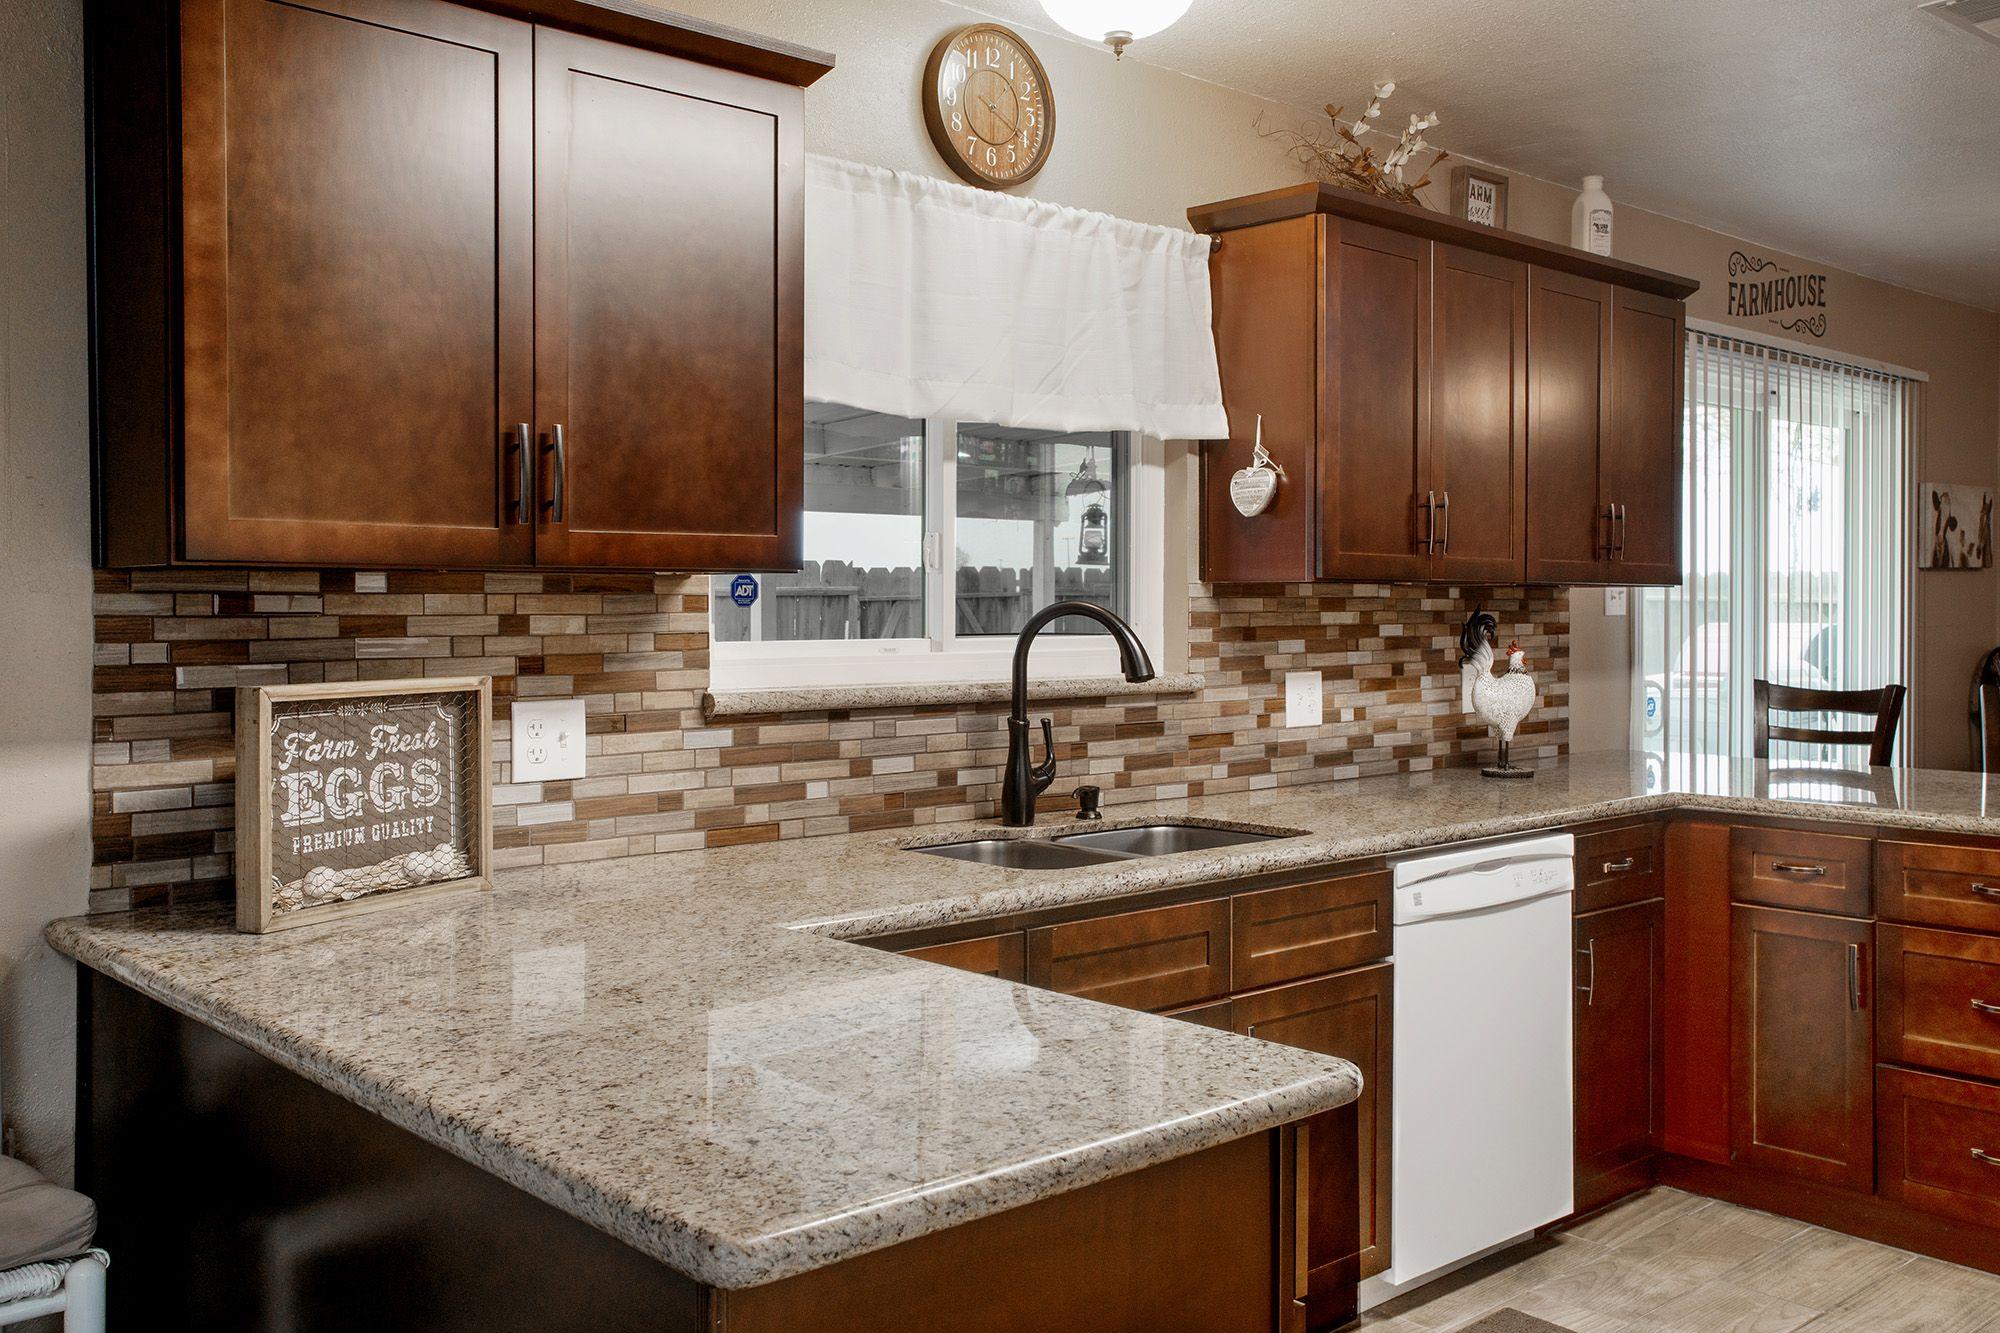 Mto0332 Modern Linear Brown Glossy Wood Grain Recycled Glass Mosaic Tile Mosaic Backsplash Kitchen Kitchen Plans Kitchen Design